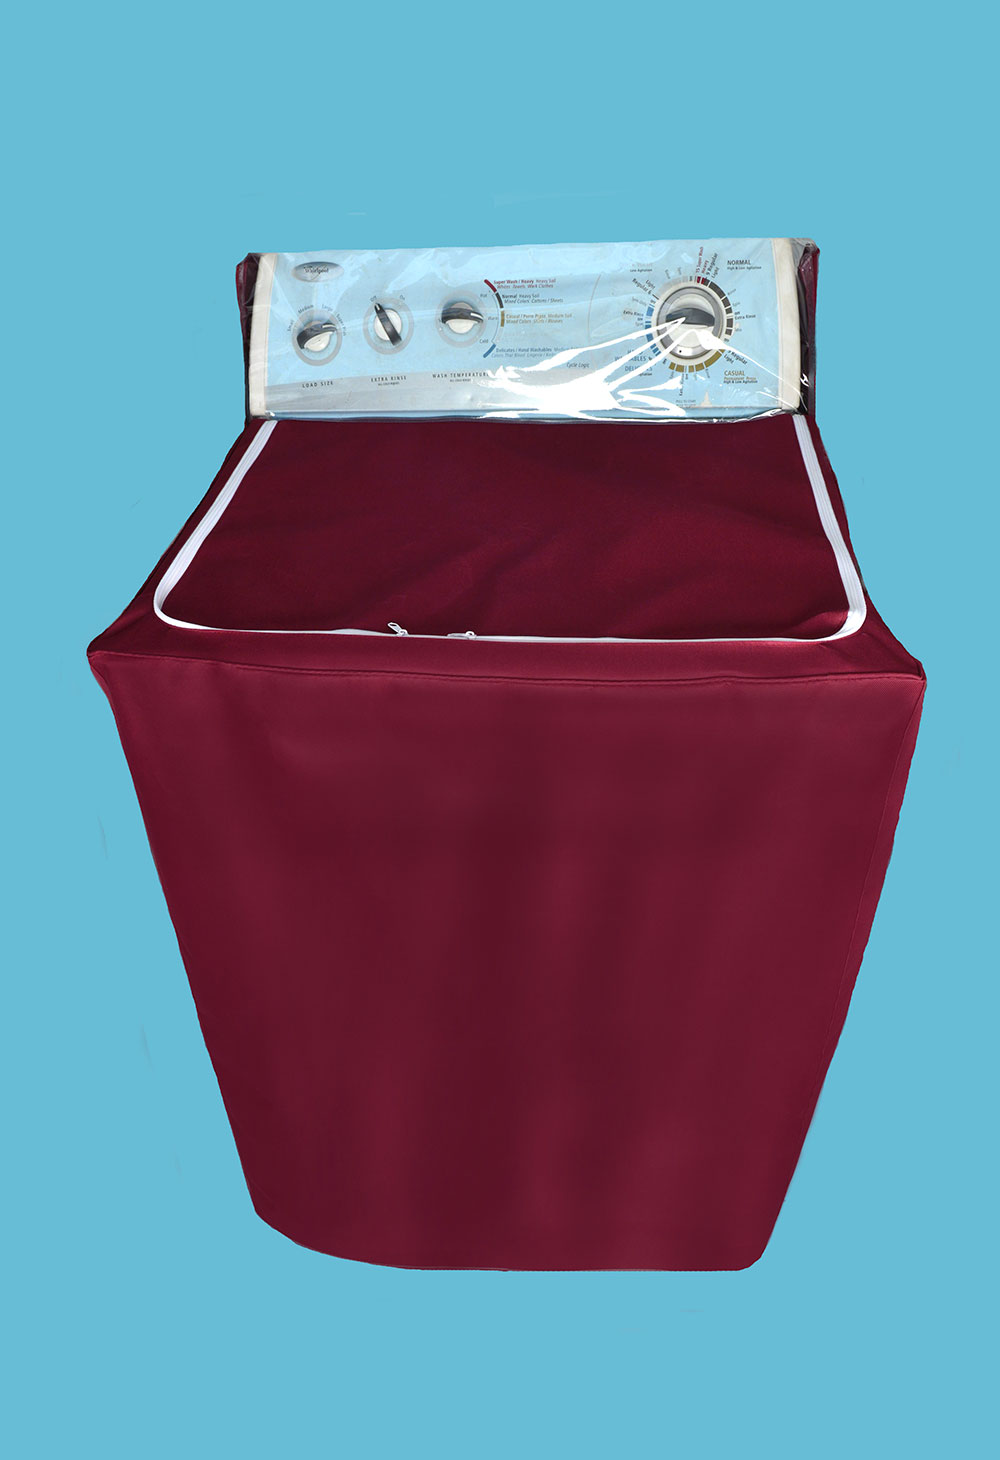 protector de lavadora estandar manual